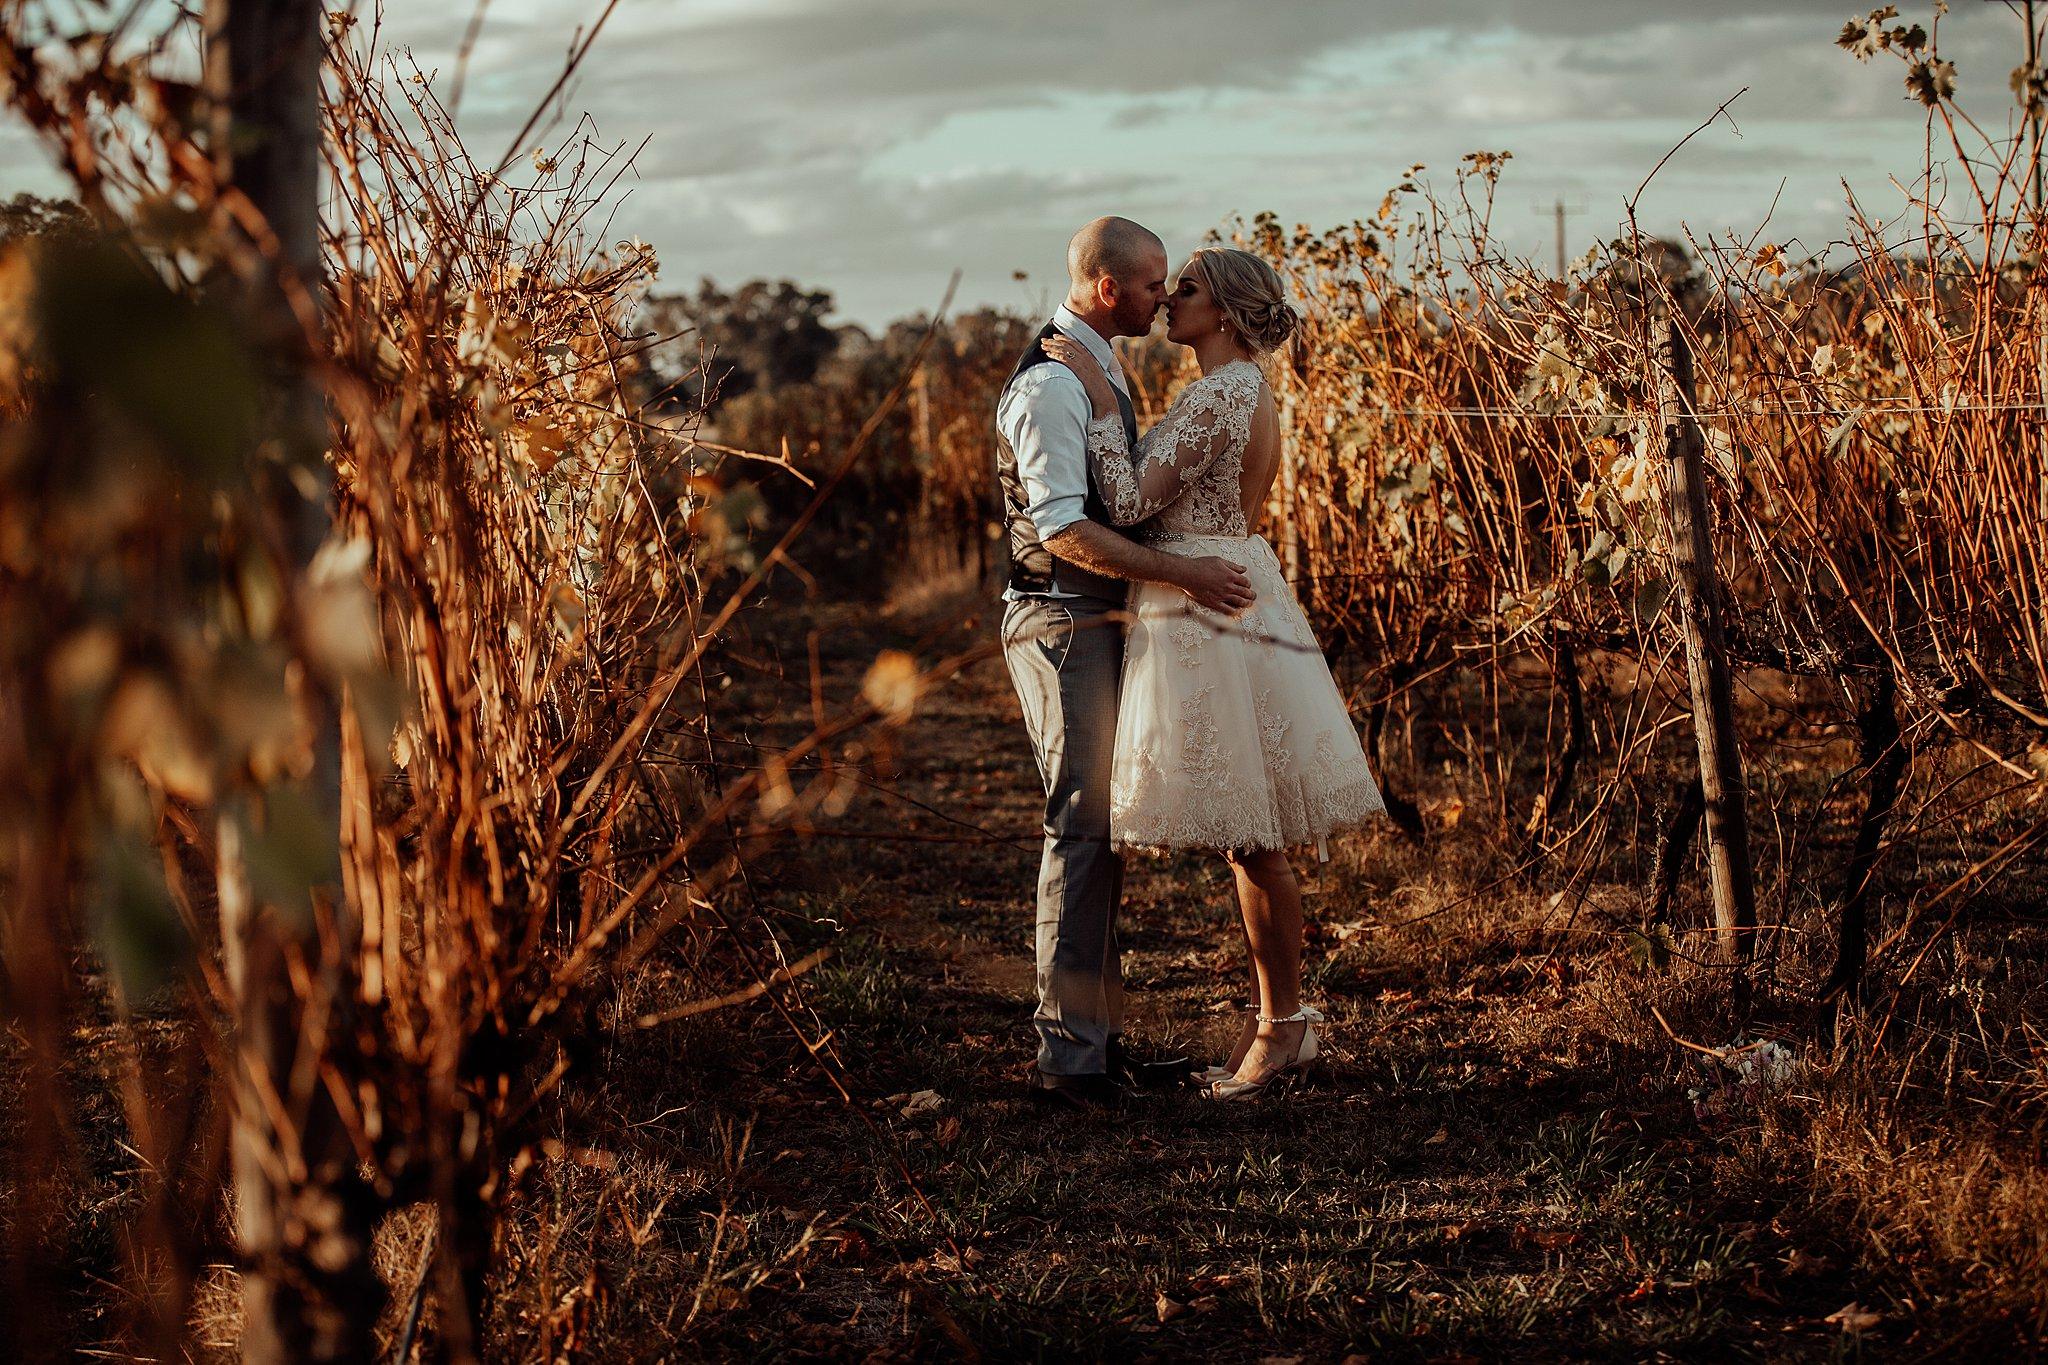 mickalathomas_puremacphotography_weddingphotographer_couplephotographer_Sheppartonphotographer_3468.jpg